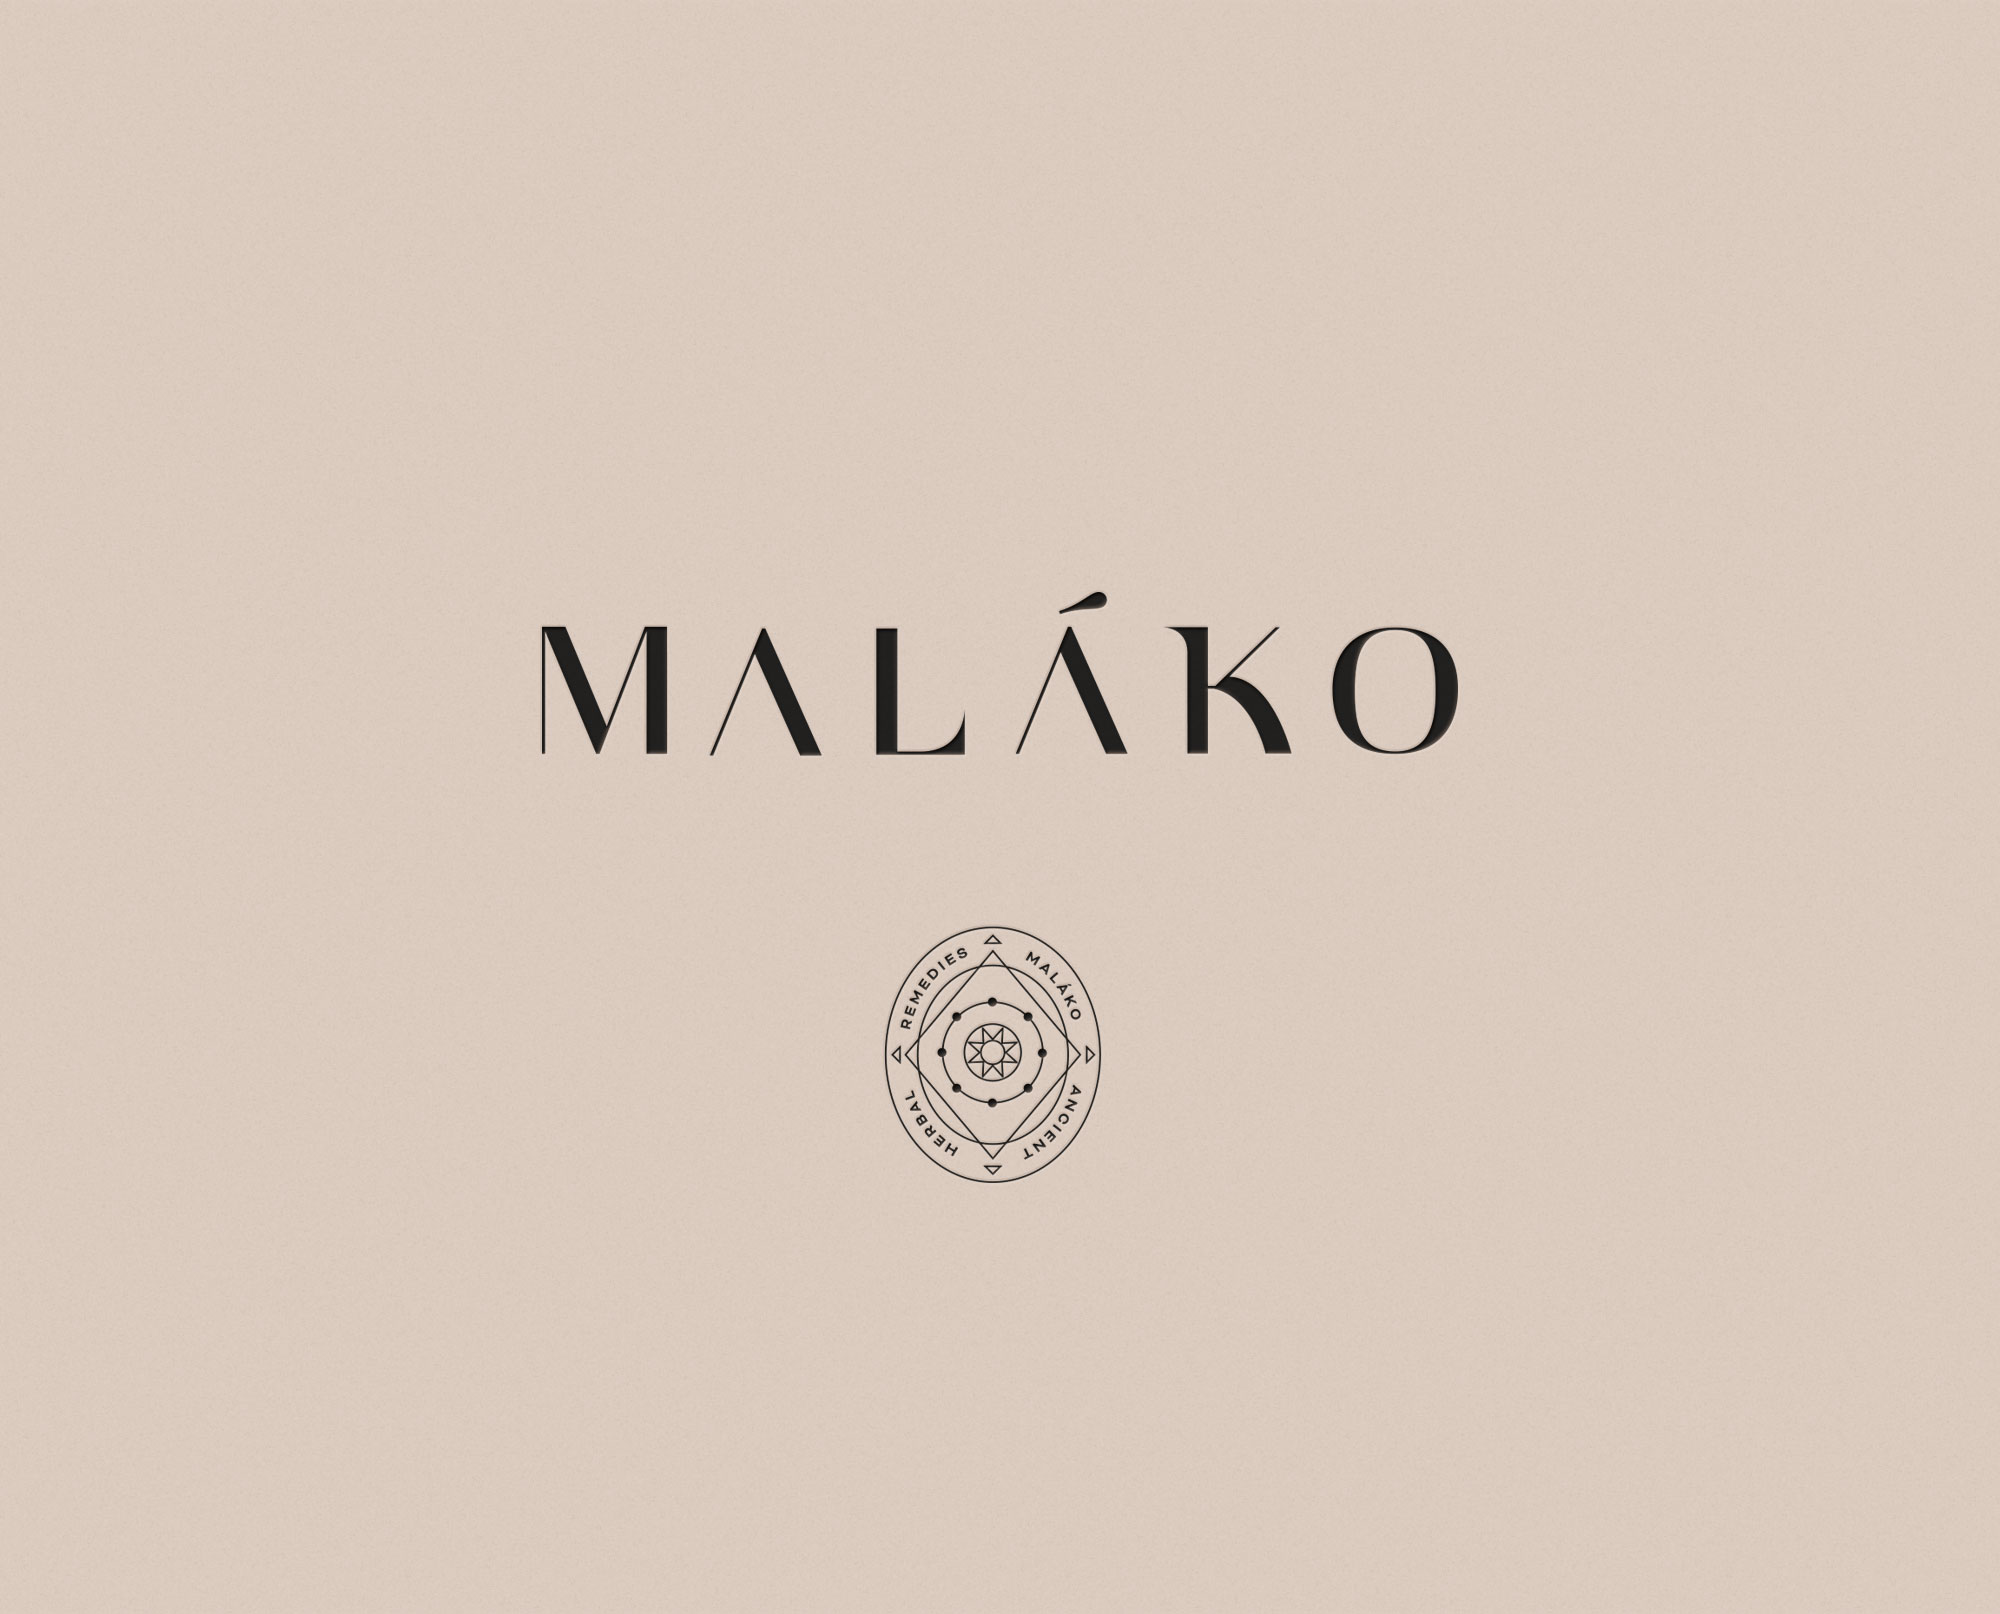 malako-skincare-logo-loolaadesigns.jpg